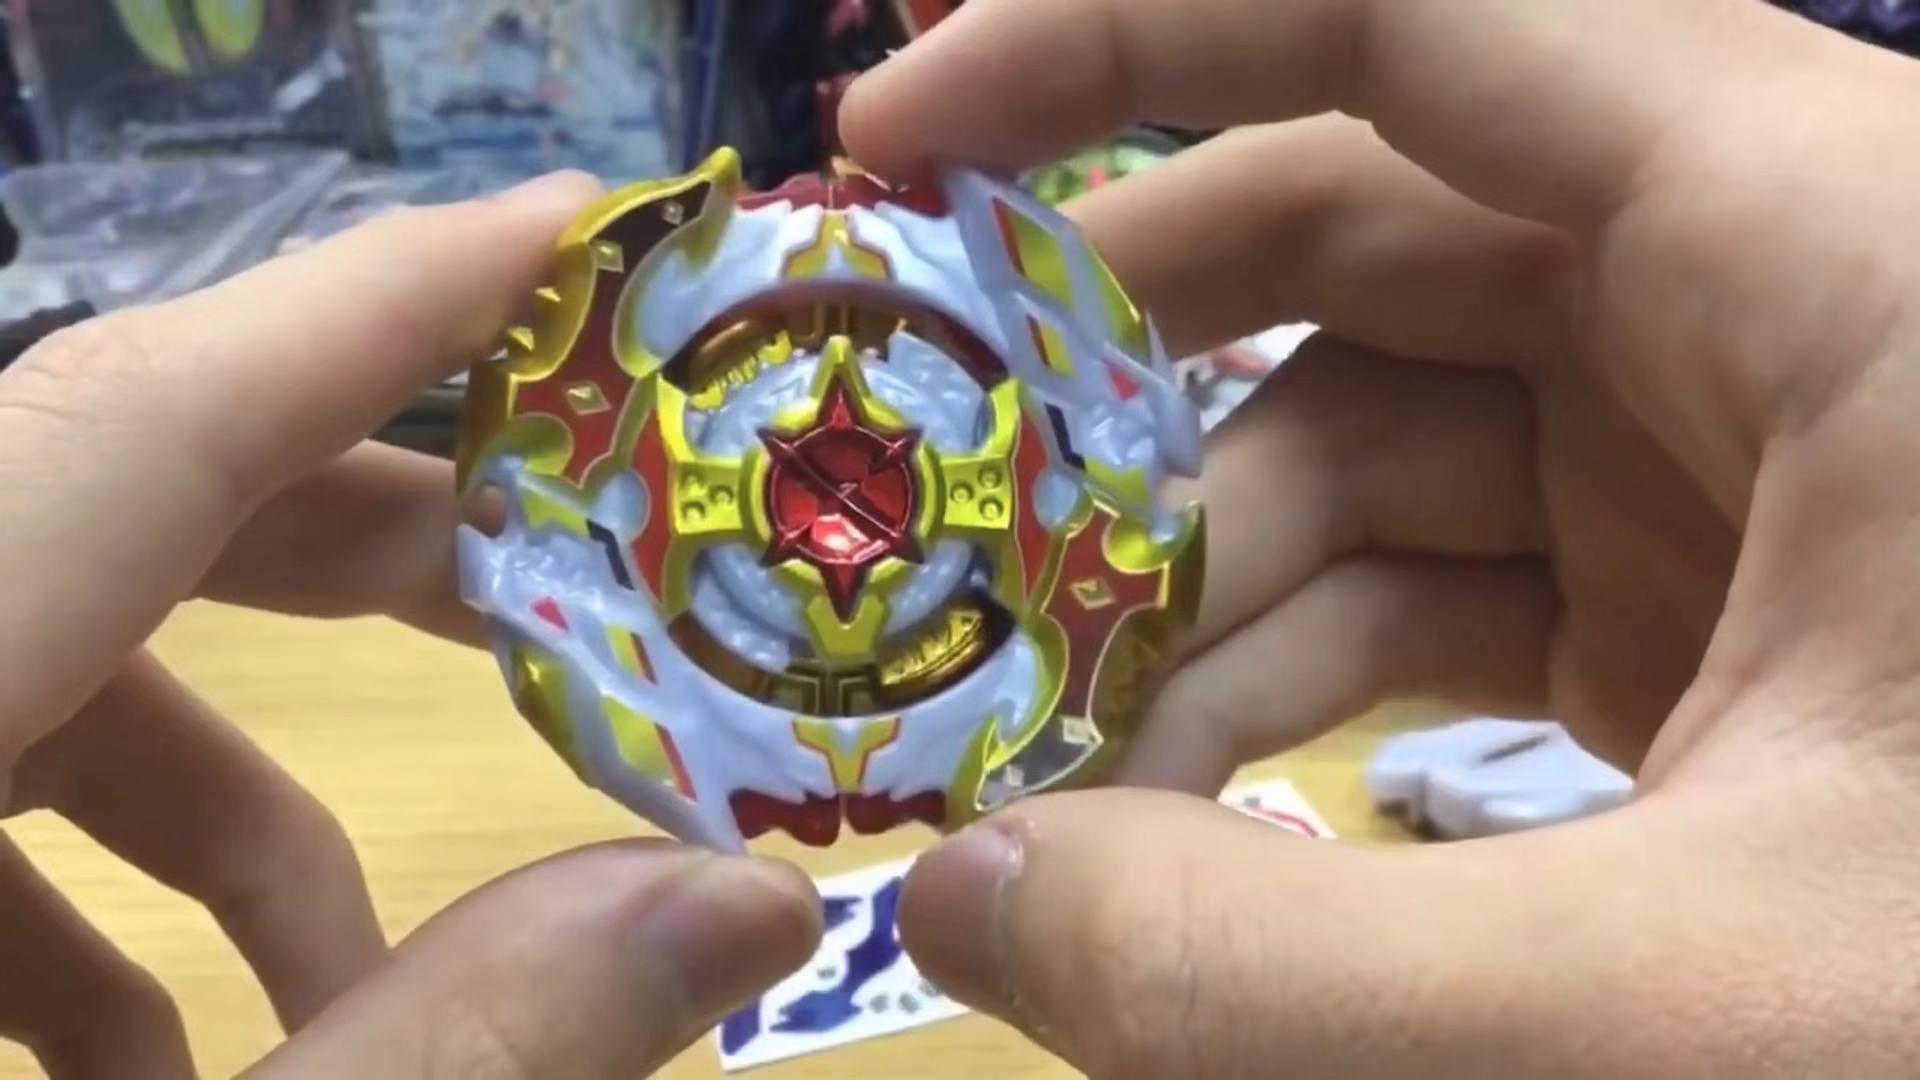 B-00 Original de lame de Bayblade de takaratomie CHO-Z Super Z Spragan (roi Royal Ver.). 10.Jl bey lame de bayblade haut Spinner jouet pour garçon